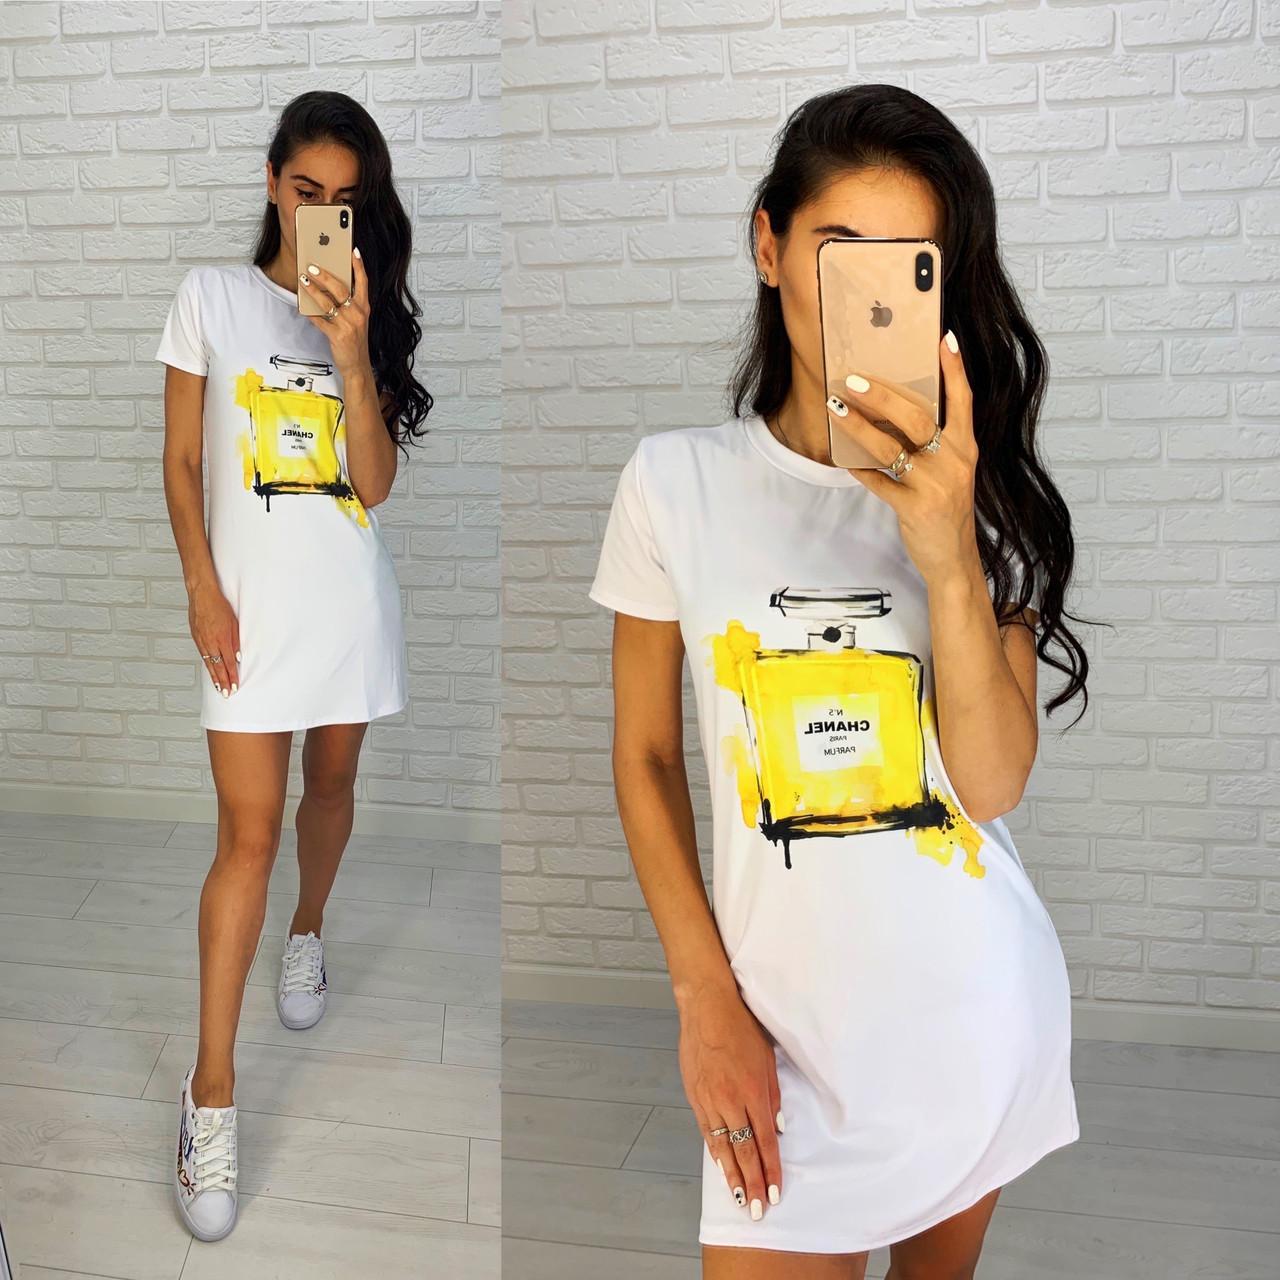 Тренд лета 2021 платье белое футболка свободное с рисунком брендов